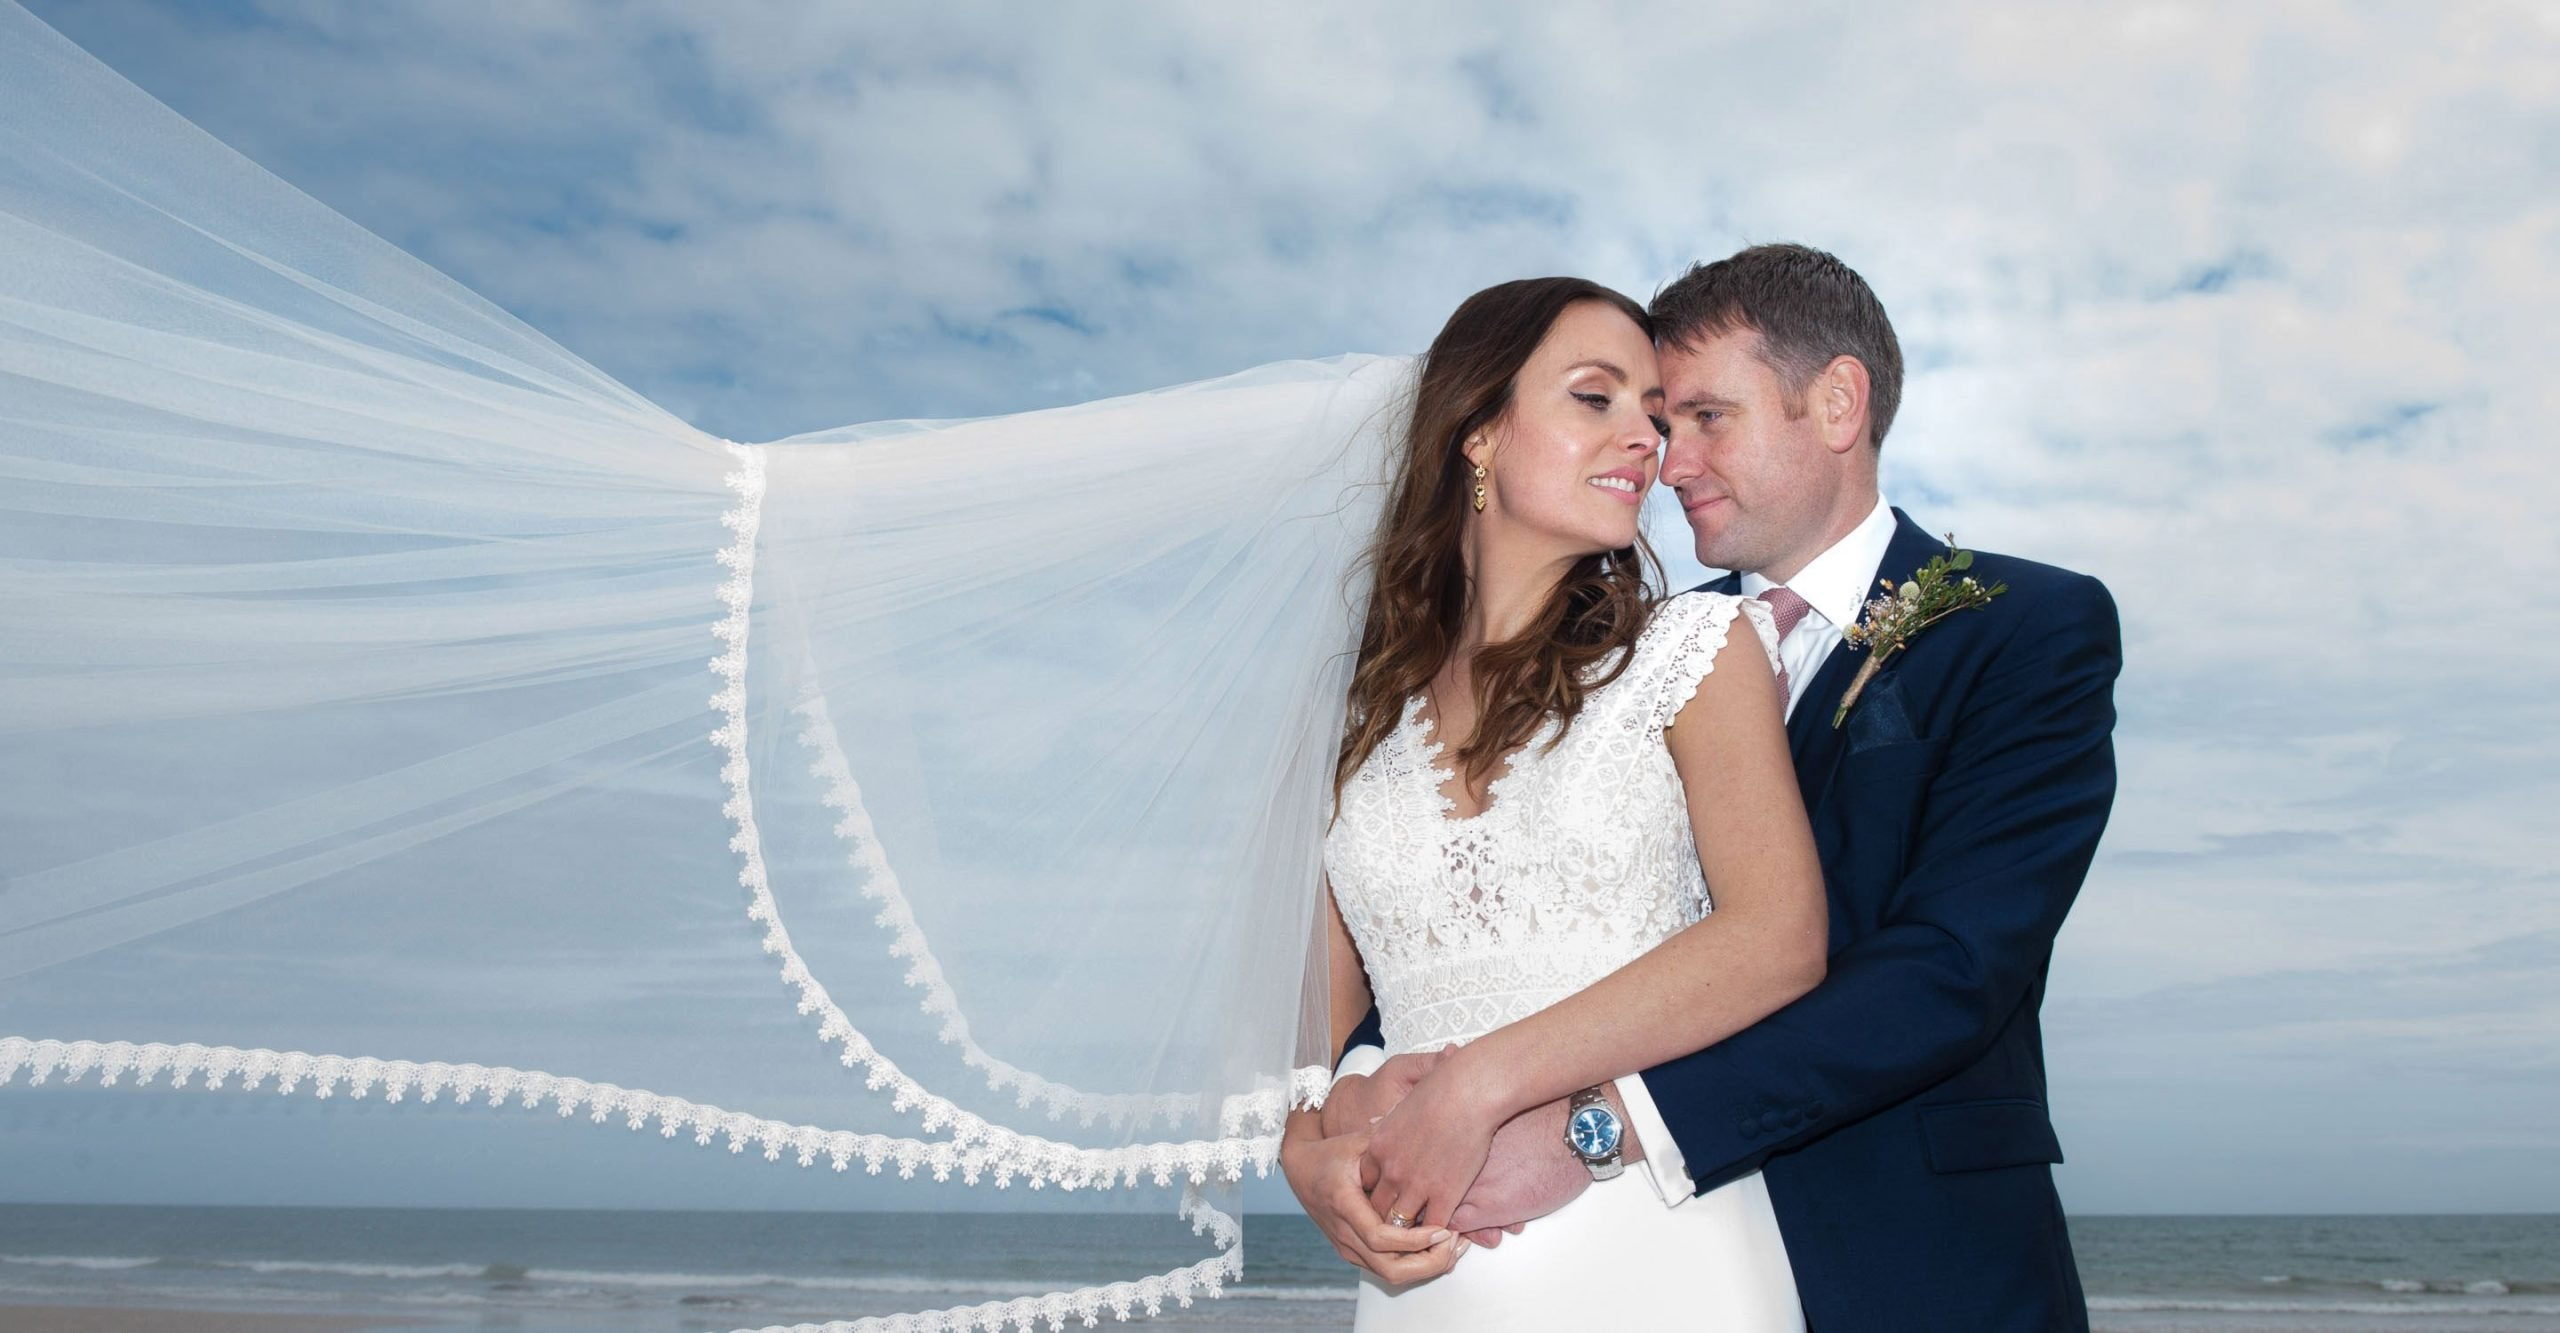 Wedding Photographer Faithlegg Waterford